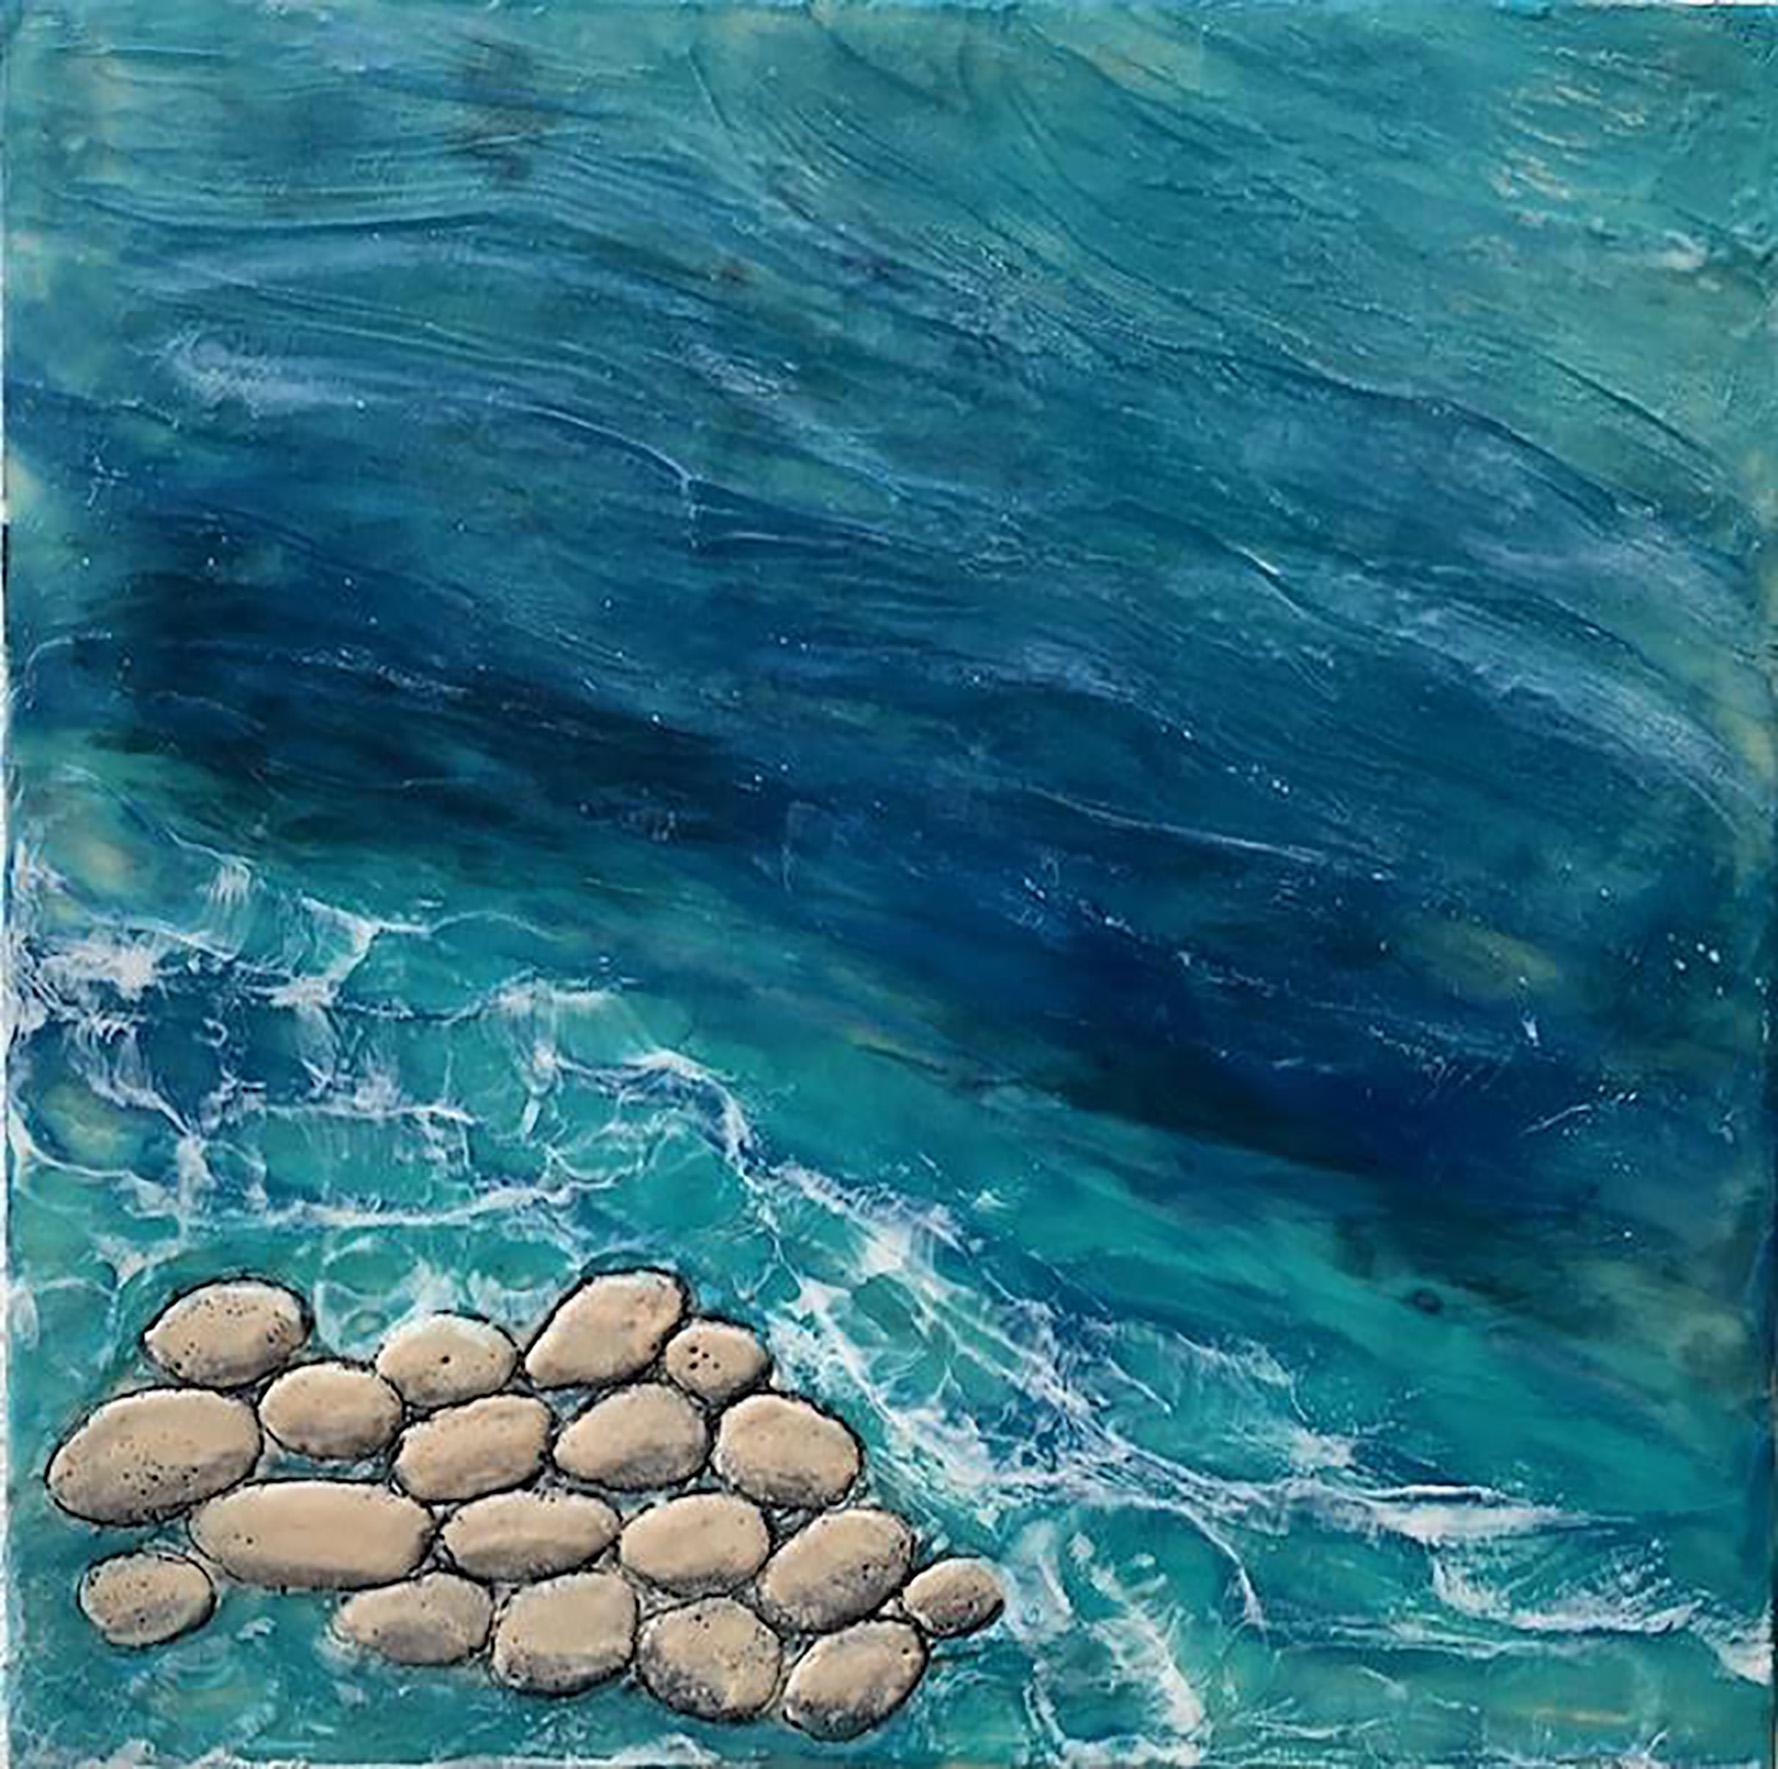 2pm - Relaxing Abstract Beach Ocean Scene w/ Rocks + Waves in Blue + Teal + Grey